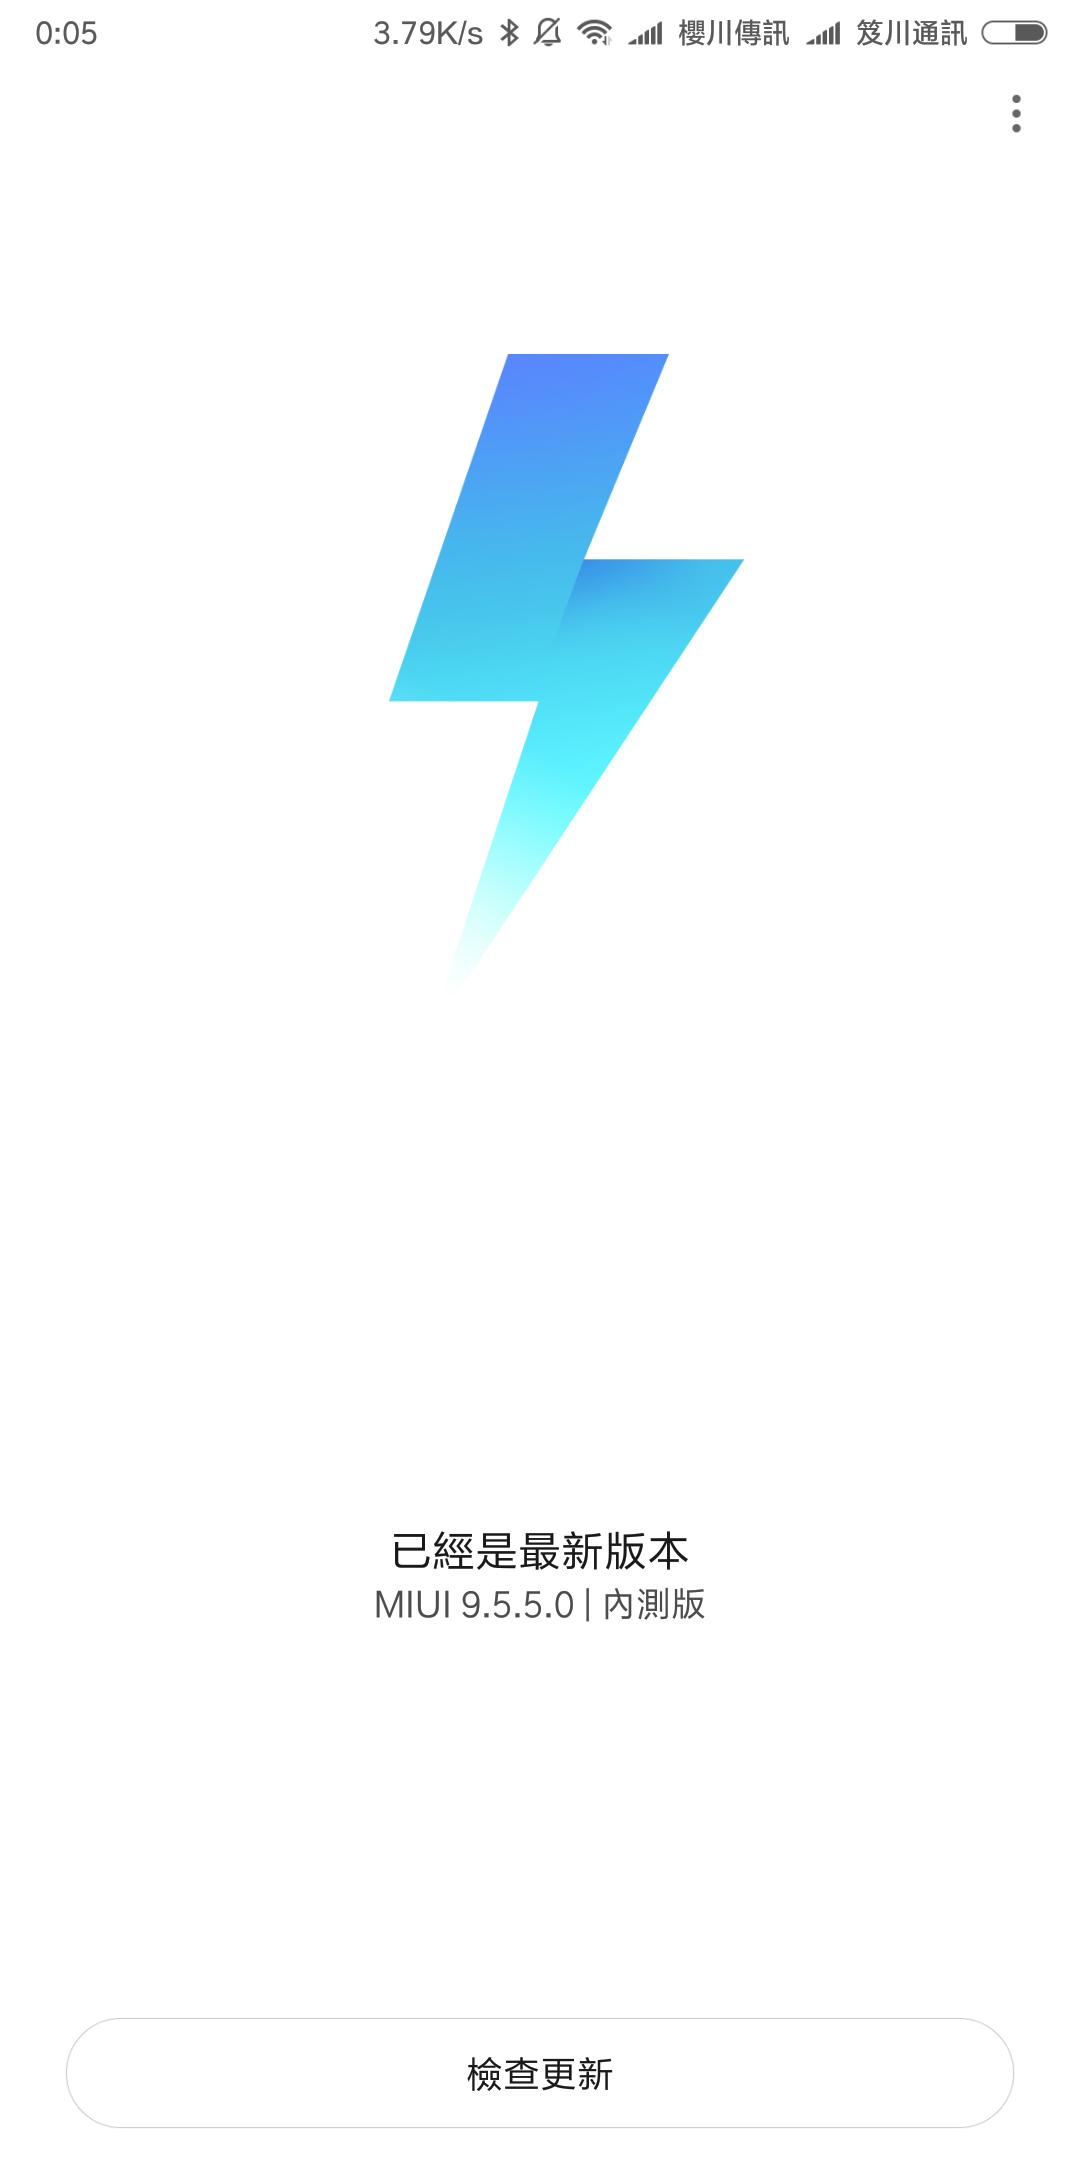 Screenshot_2018-04-15-00-05-09-864_com.android.updater